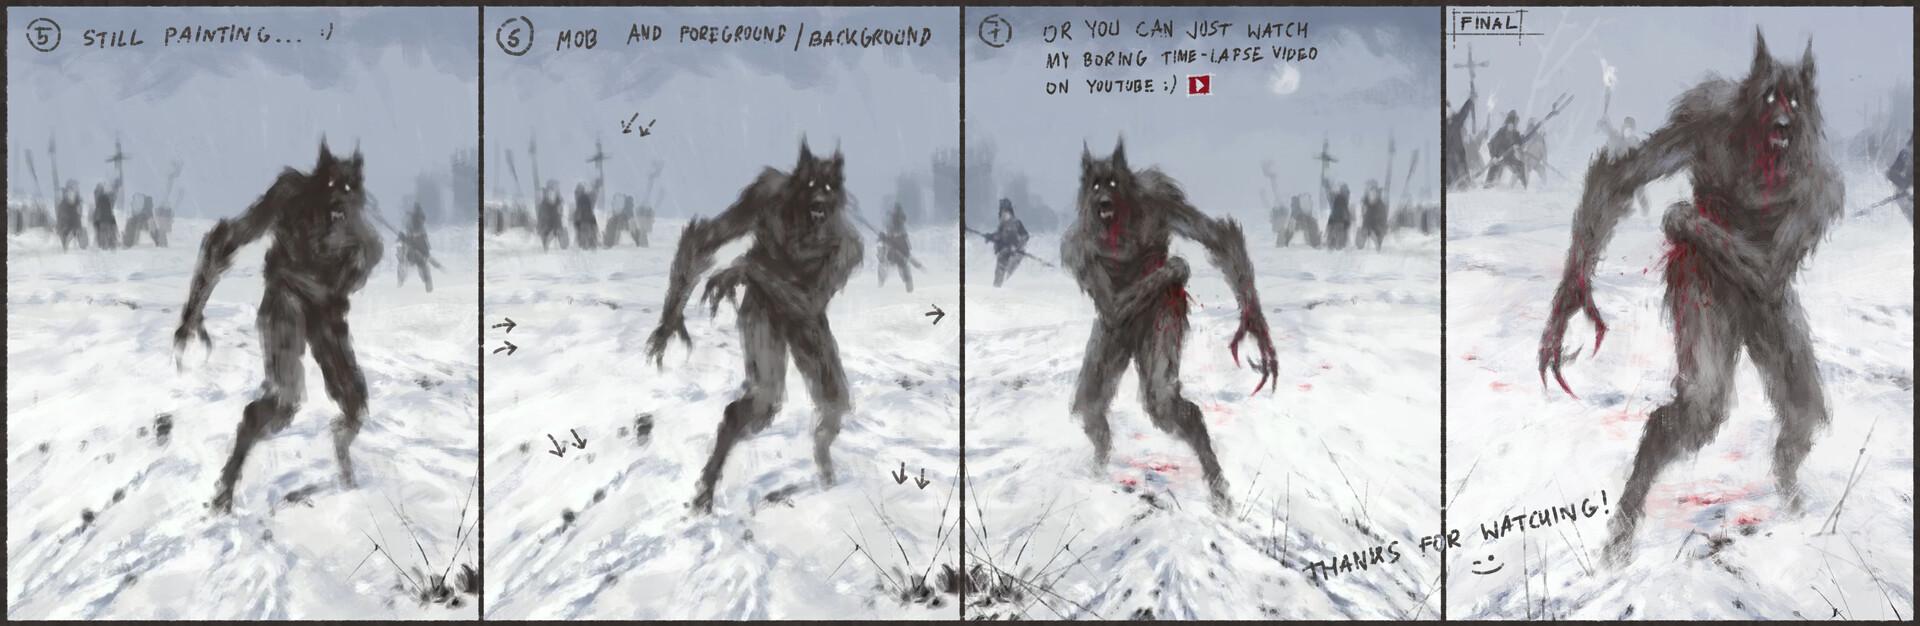 Jakub rozalski wounded wolf process01